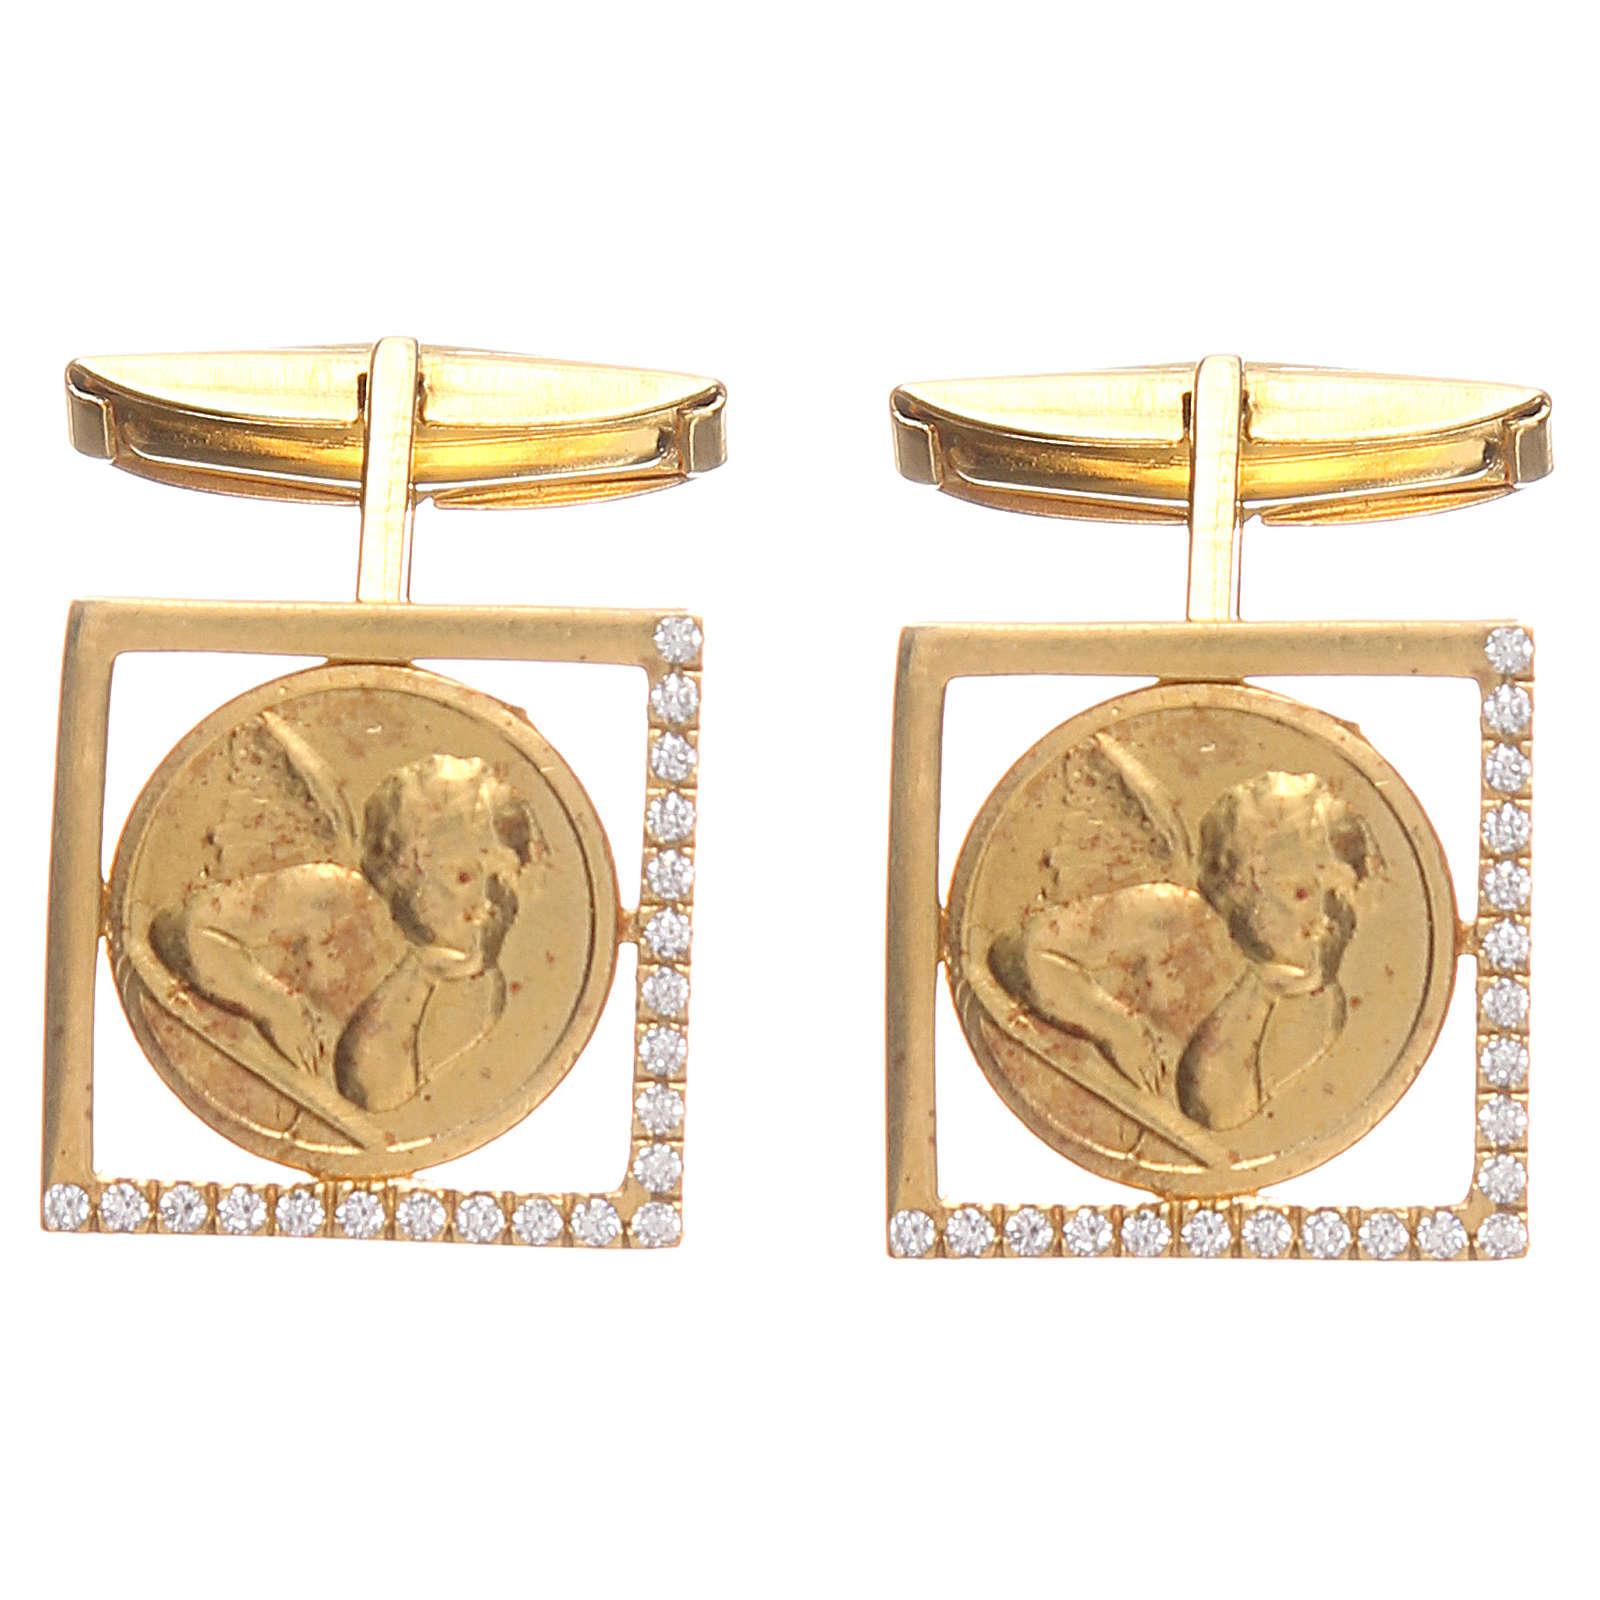 Mancuernillas joyas plata 925 Ángel Rafael 1,7x1,7 cm 4